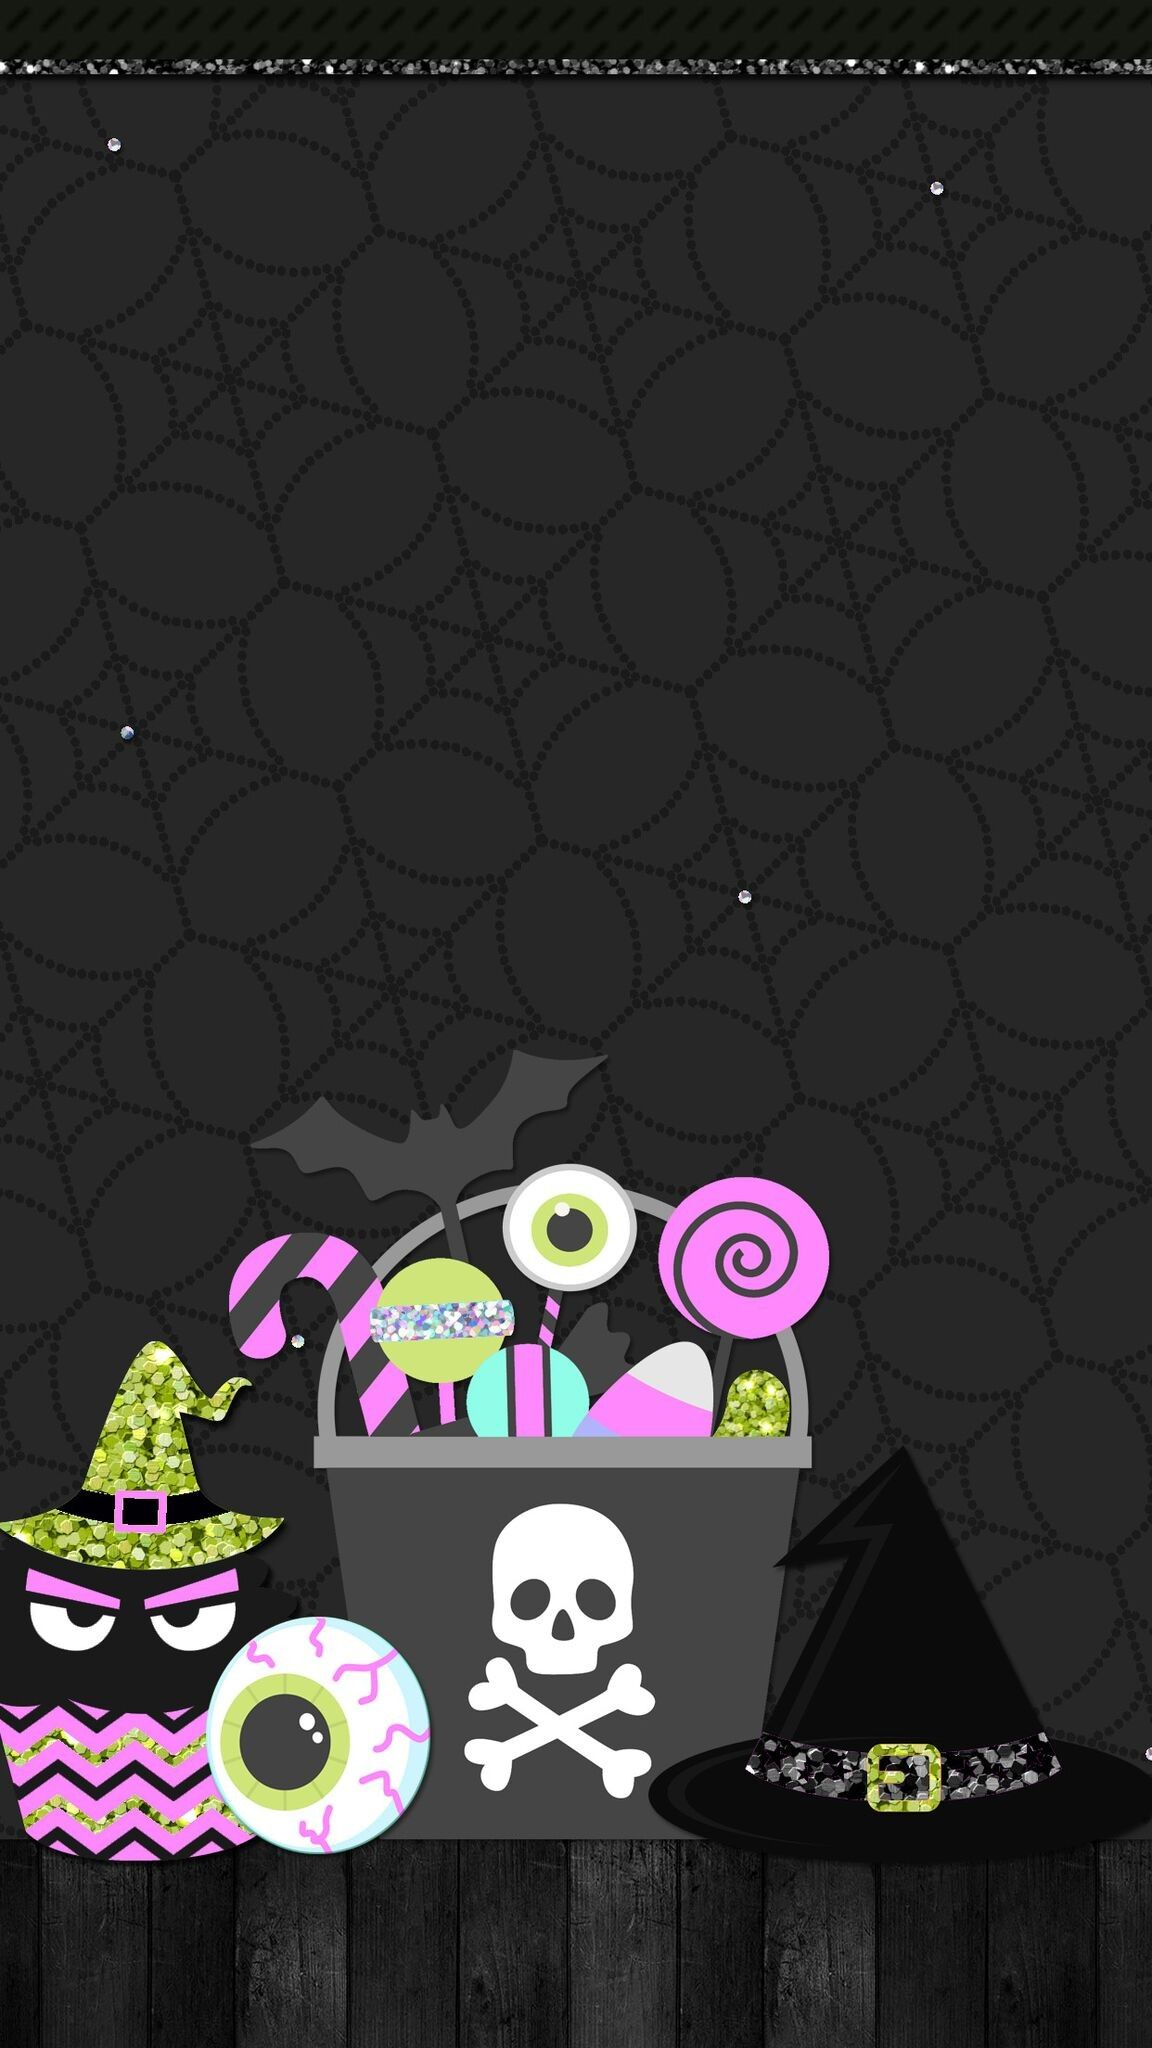 Creepy Cute Wallpaper Wallpapers 2020 Halloween Wallpaper